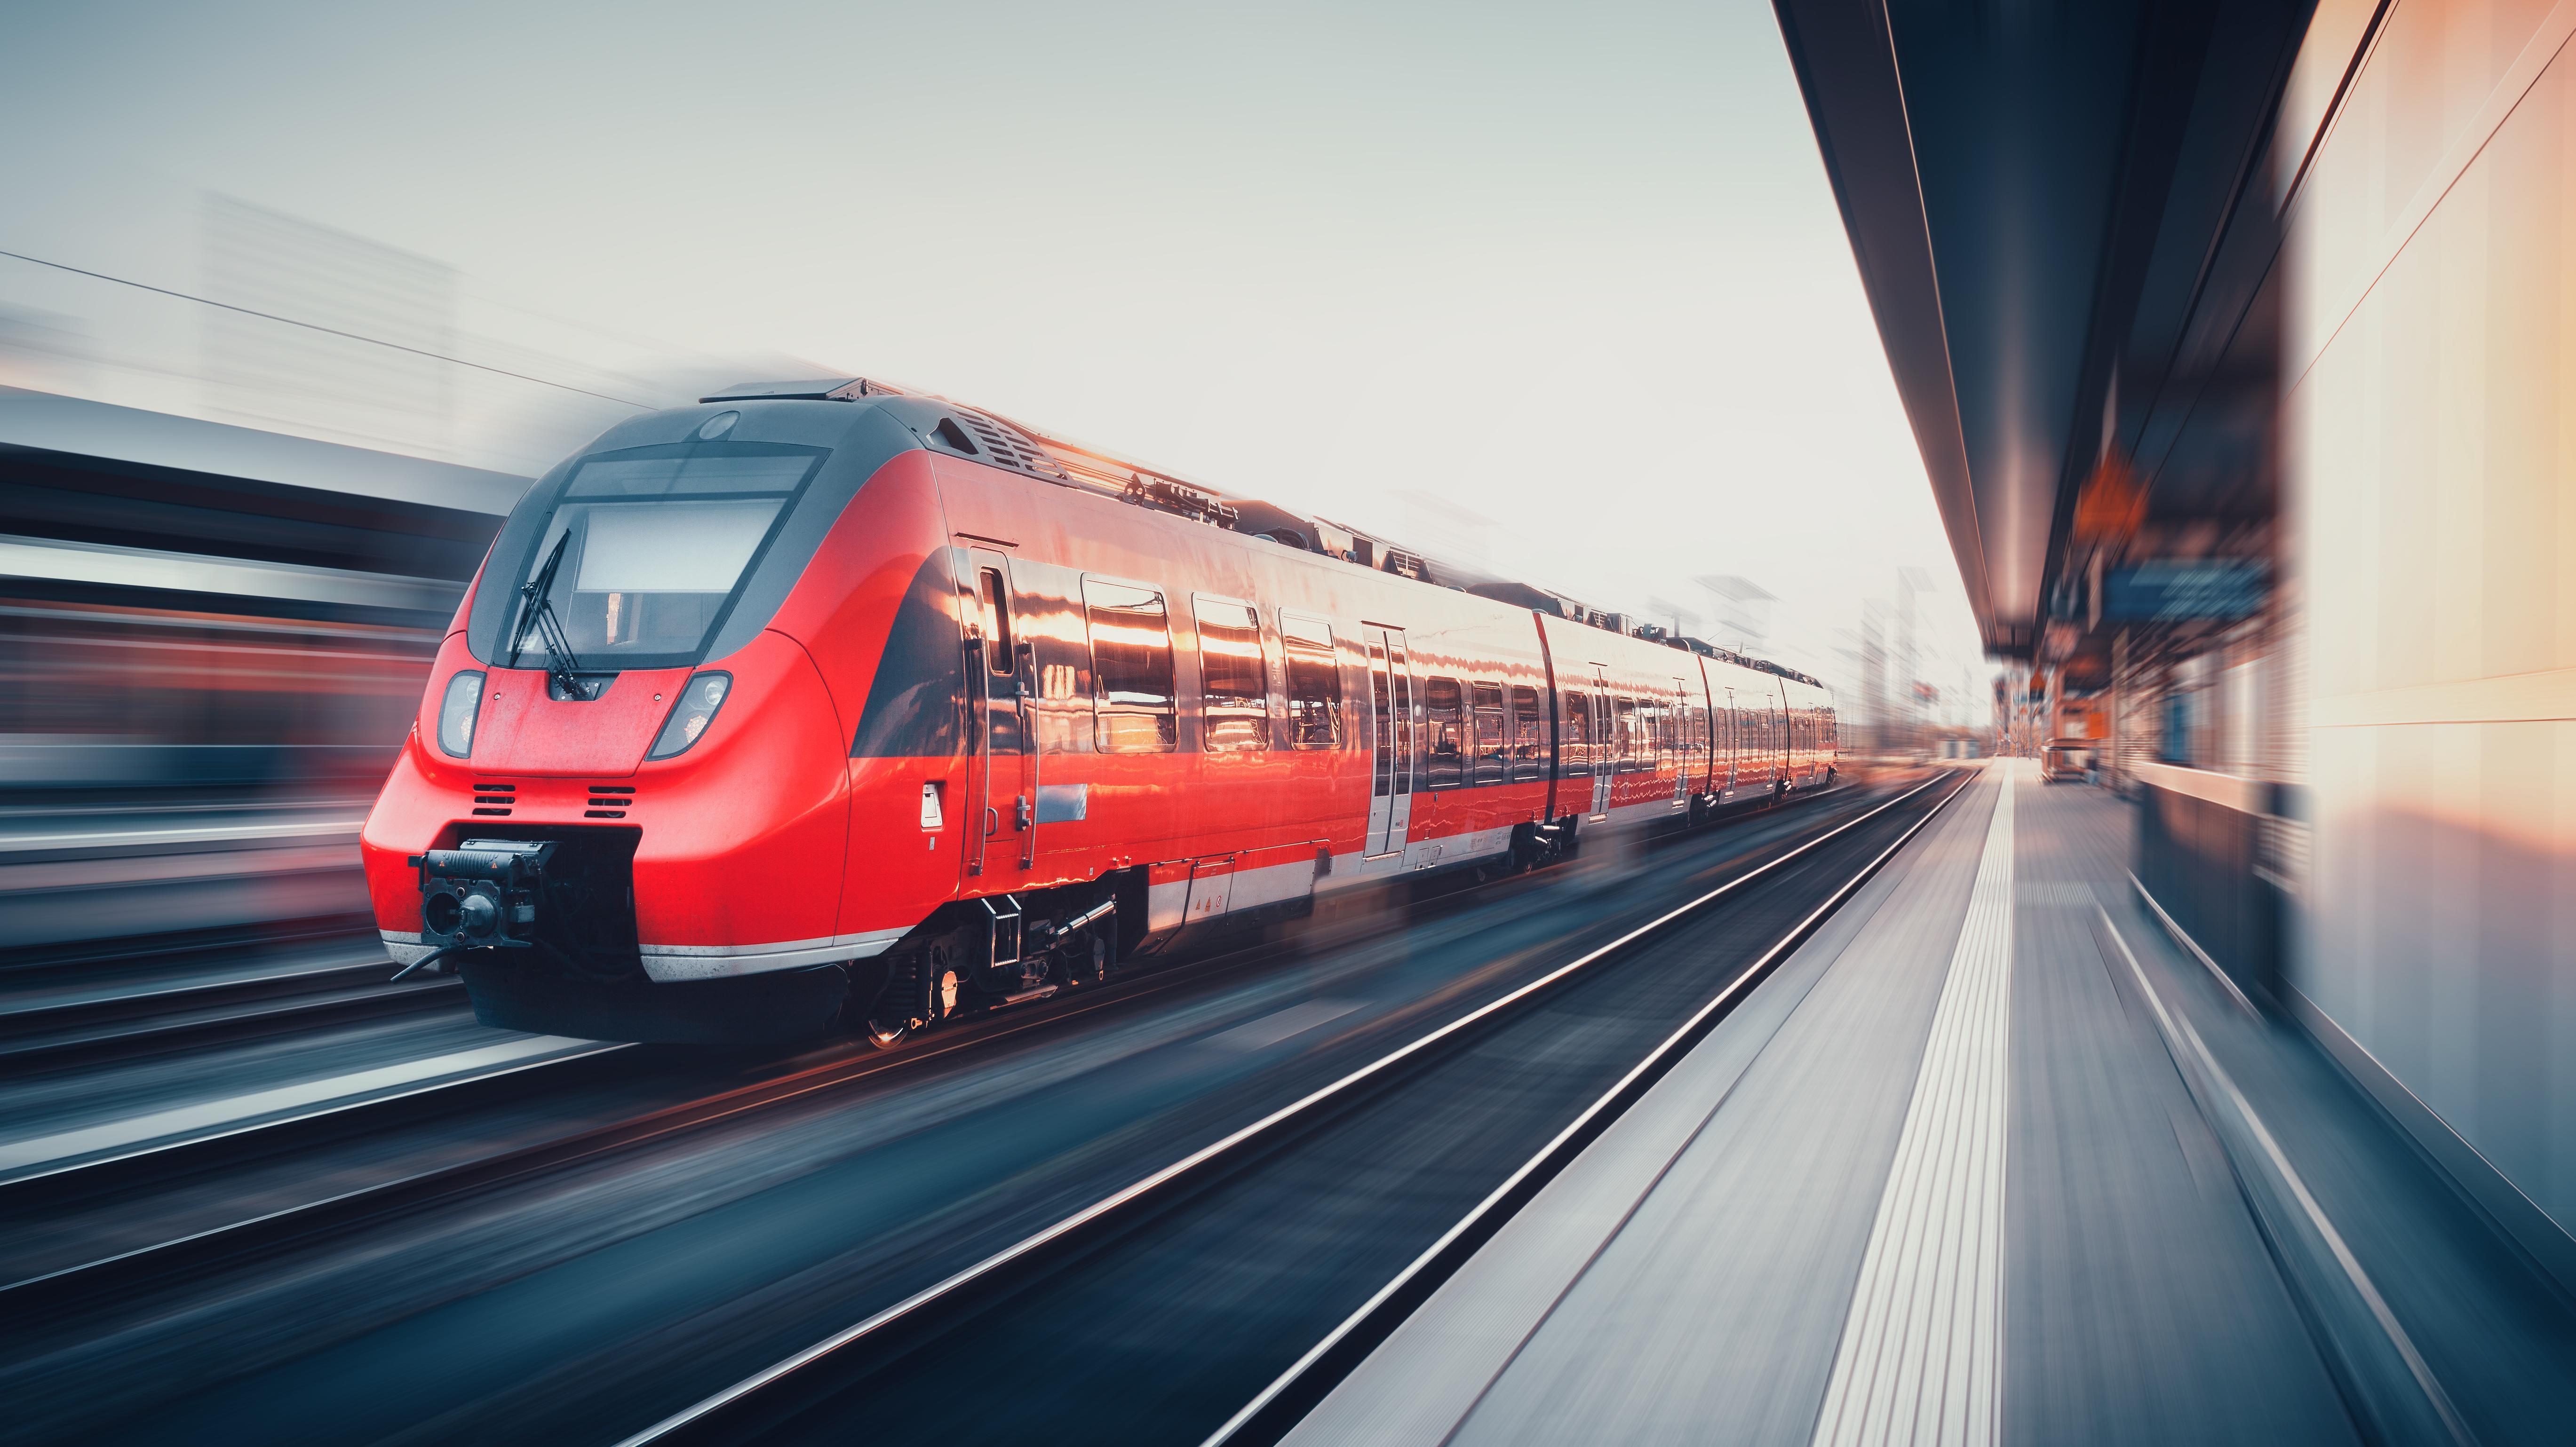 Zug am Bahnhof in Nürnberg.